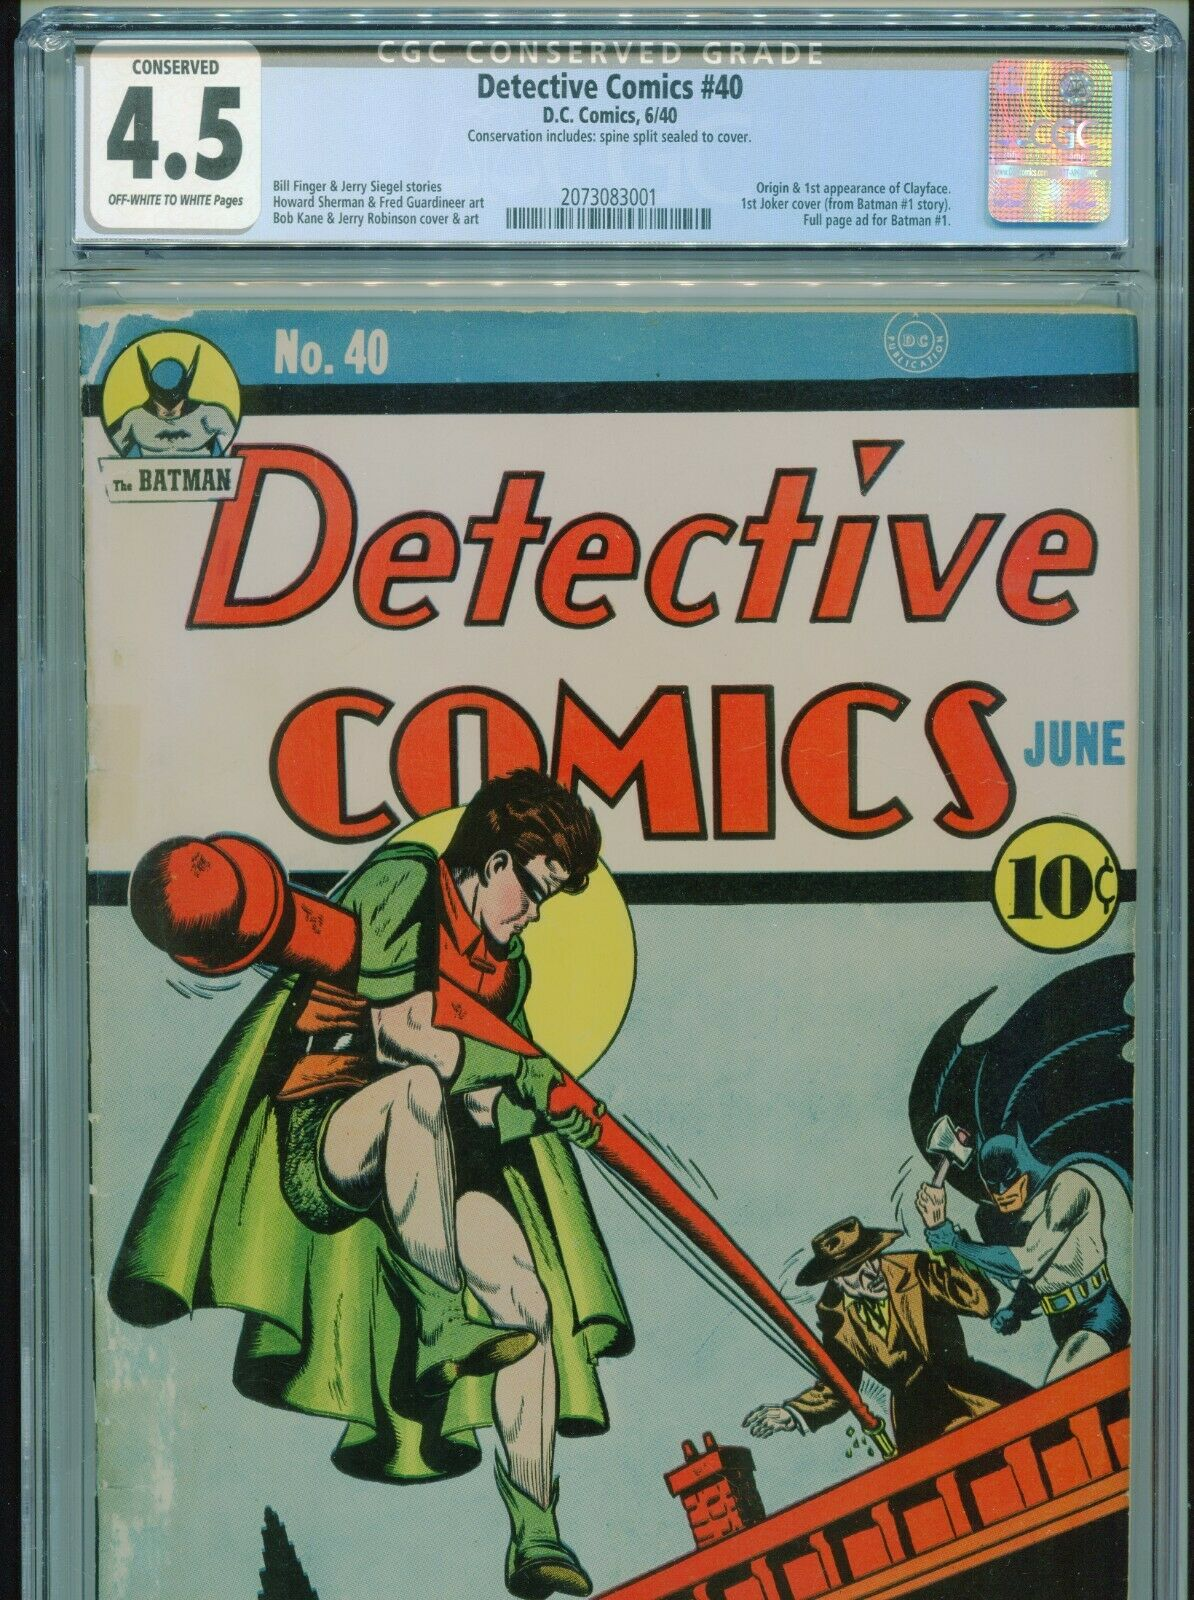 1940 DC DETECTIVE COMICS 40 1ST APPEARANCE CLAYFACE 1ST JOKER COVER CGC 45 OWW